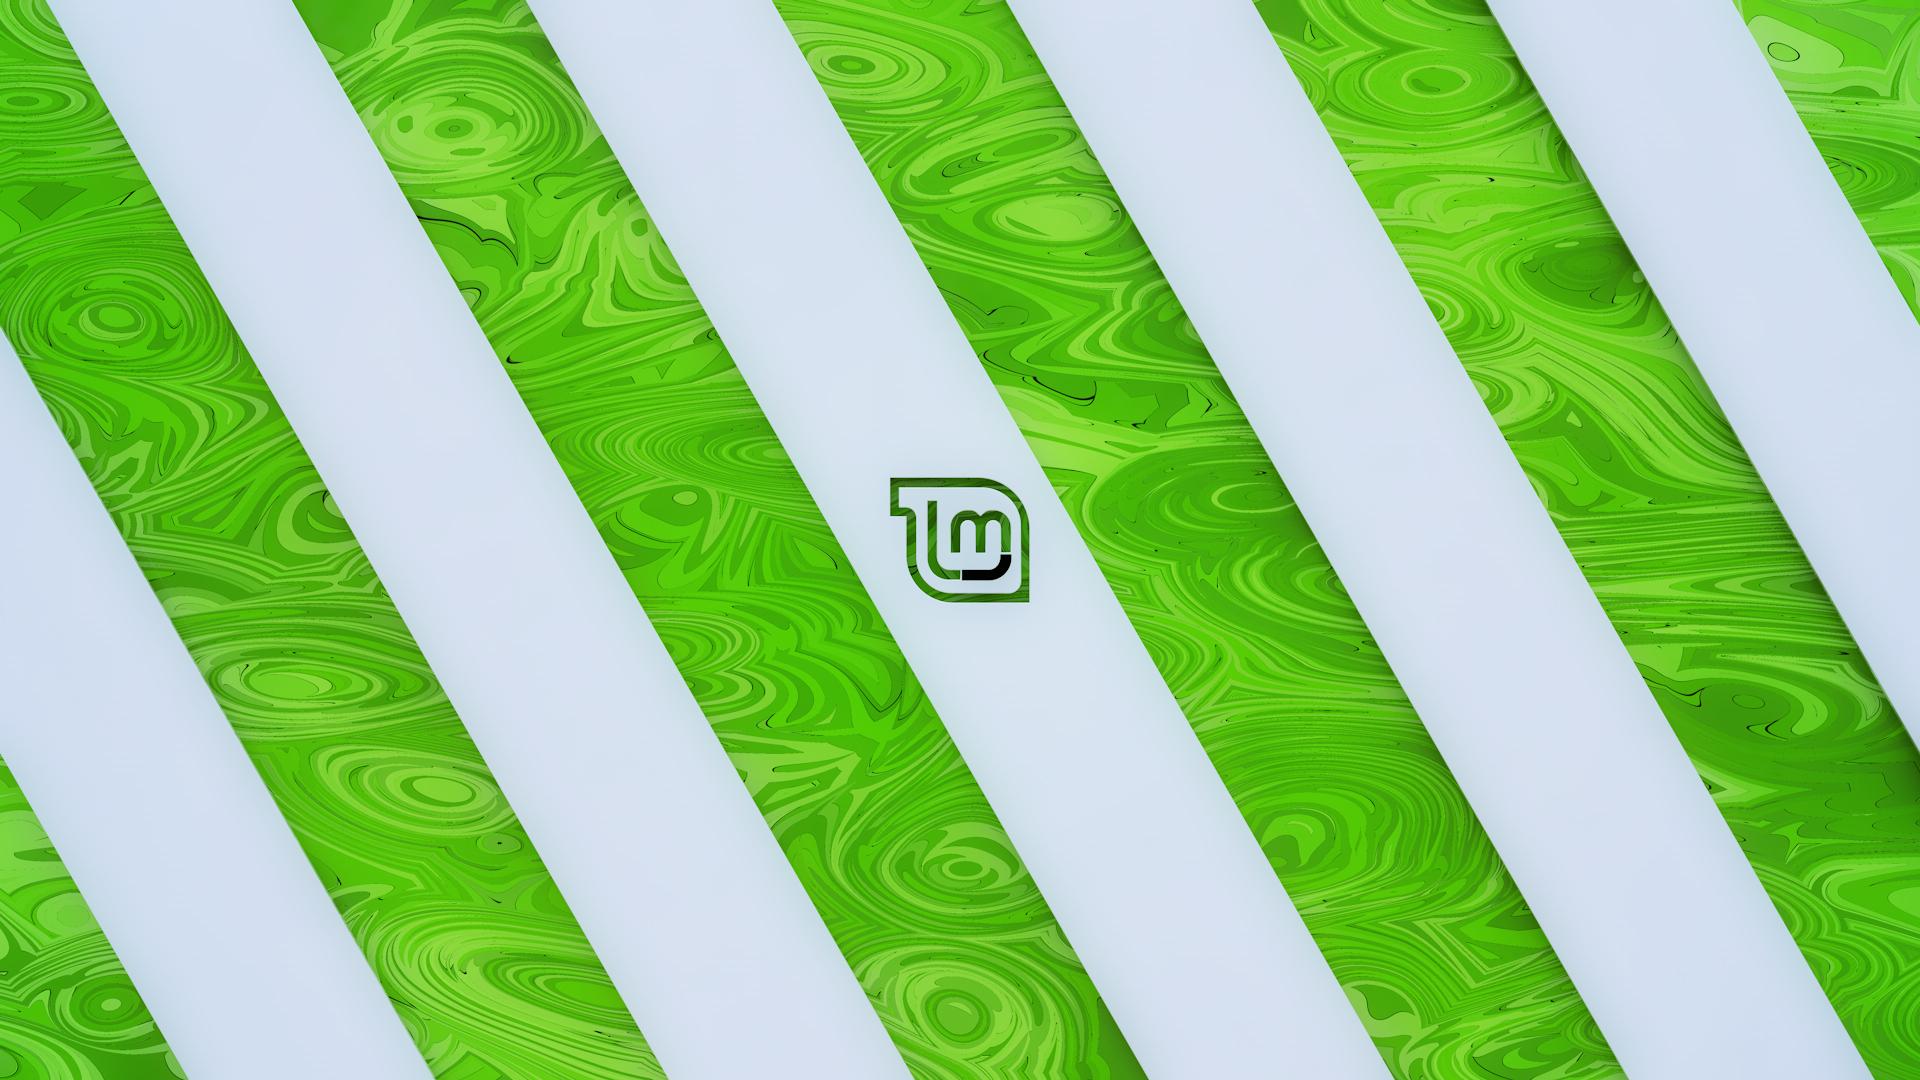 Linux Mint by xylomon